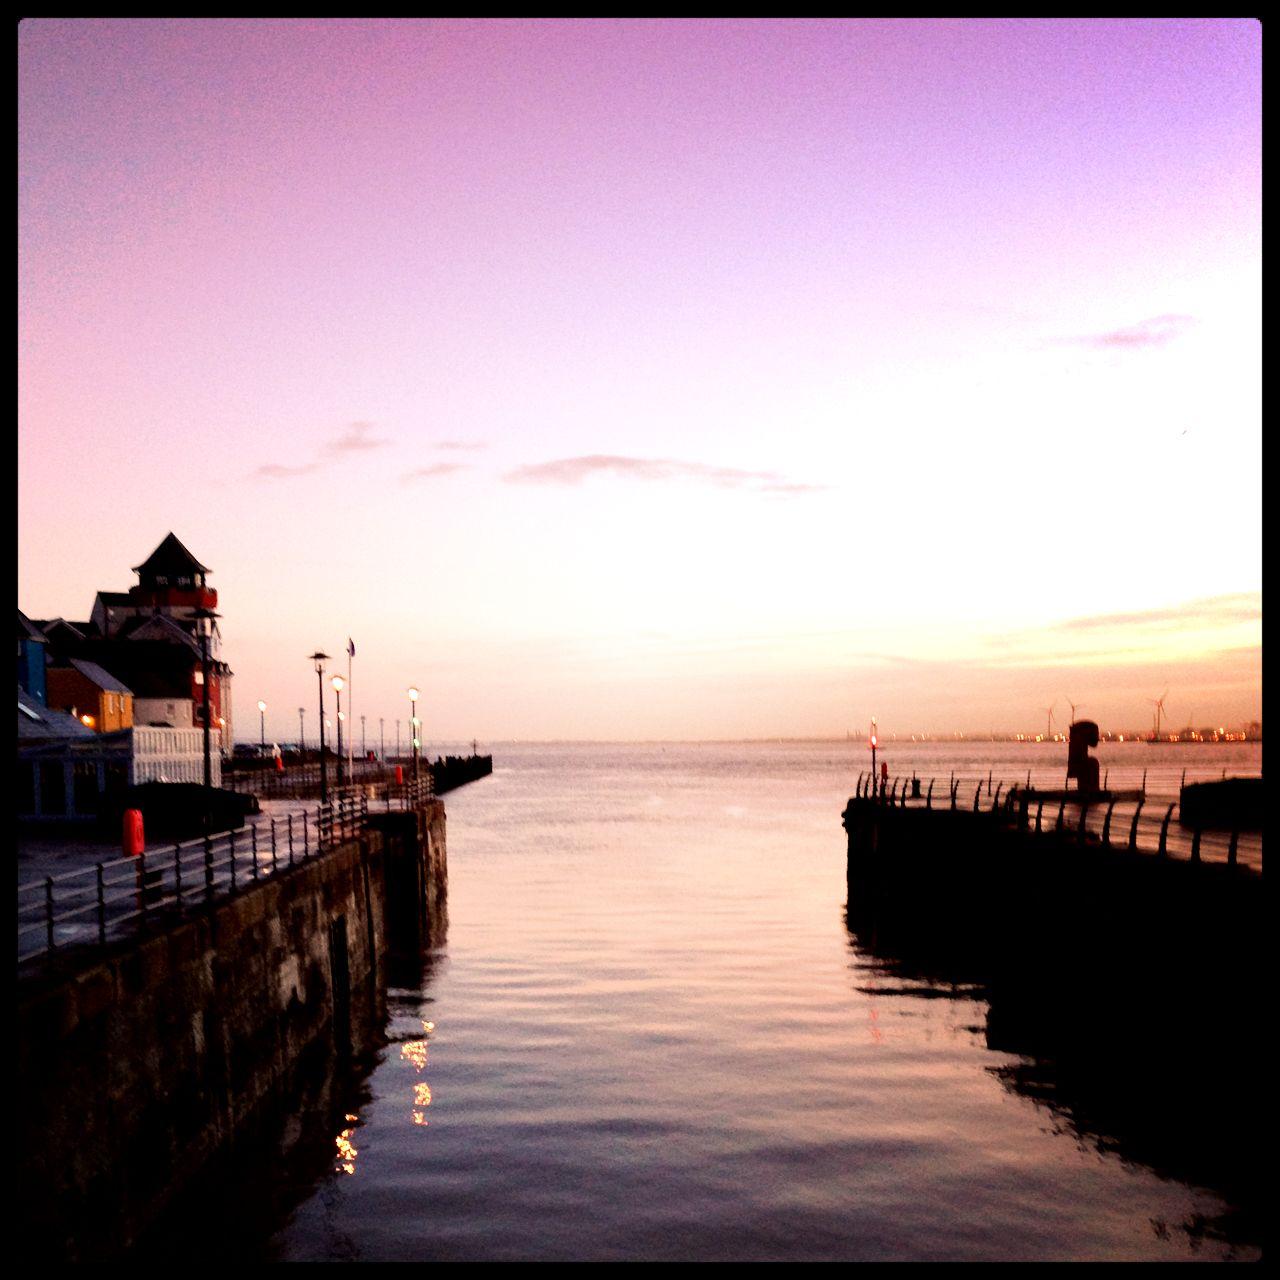 Portishead Marina   Coastal towns, Marina, Bath and beyond